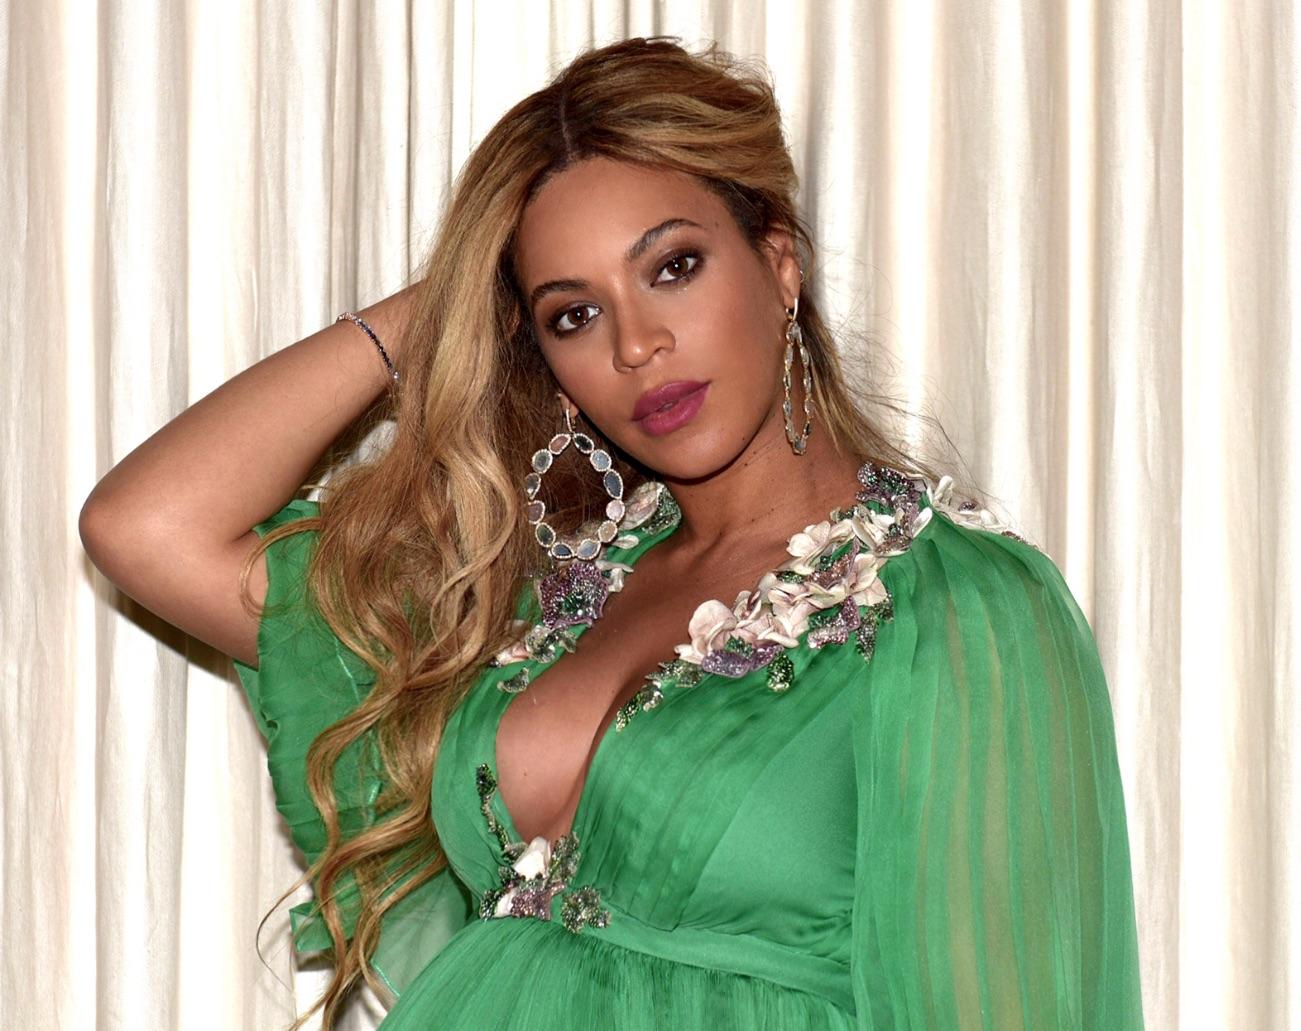 Beyoncé glows radiantly wearing Kimberly McDonald jewelry